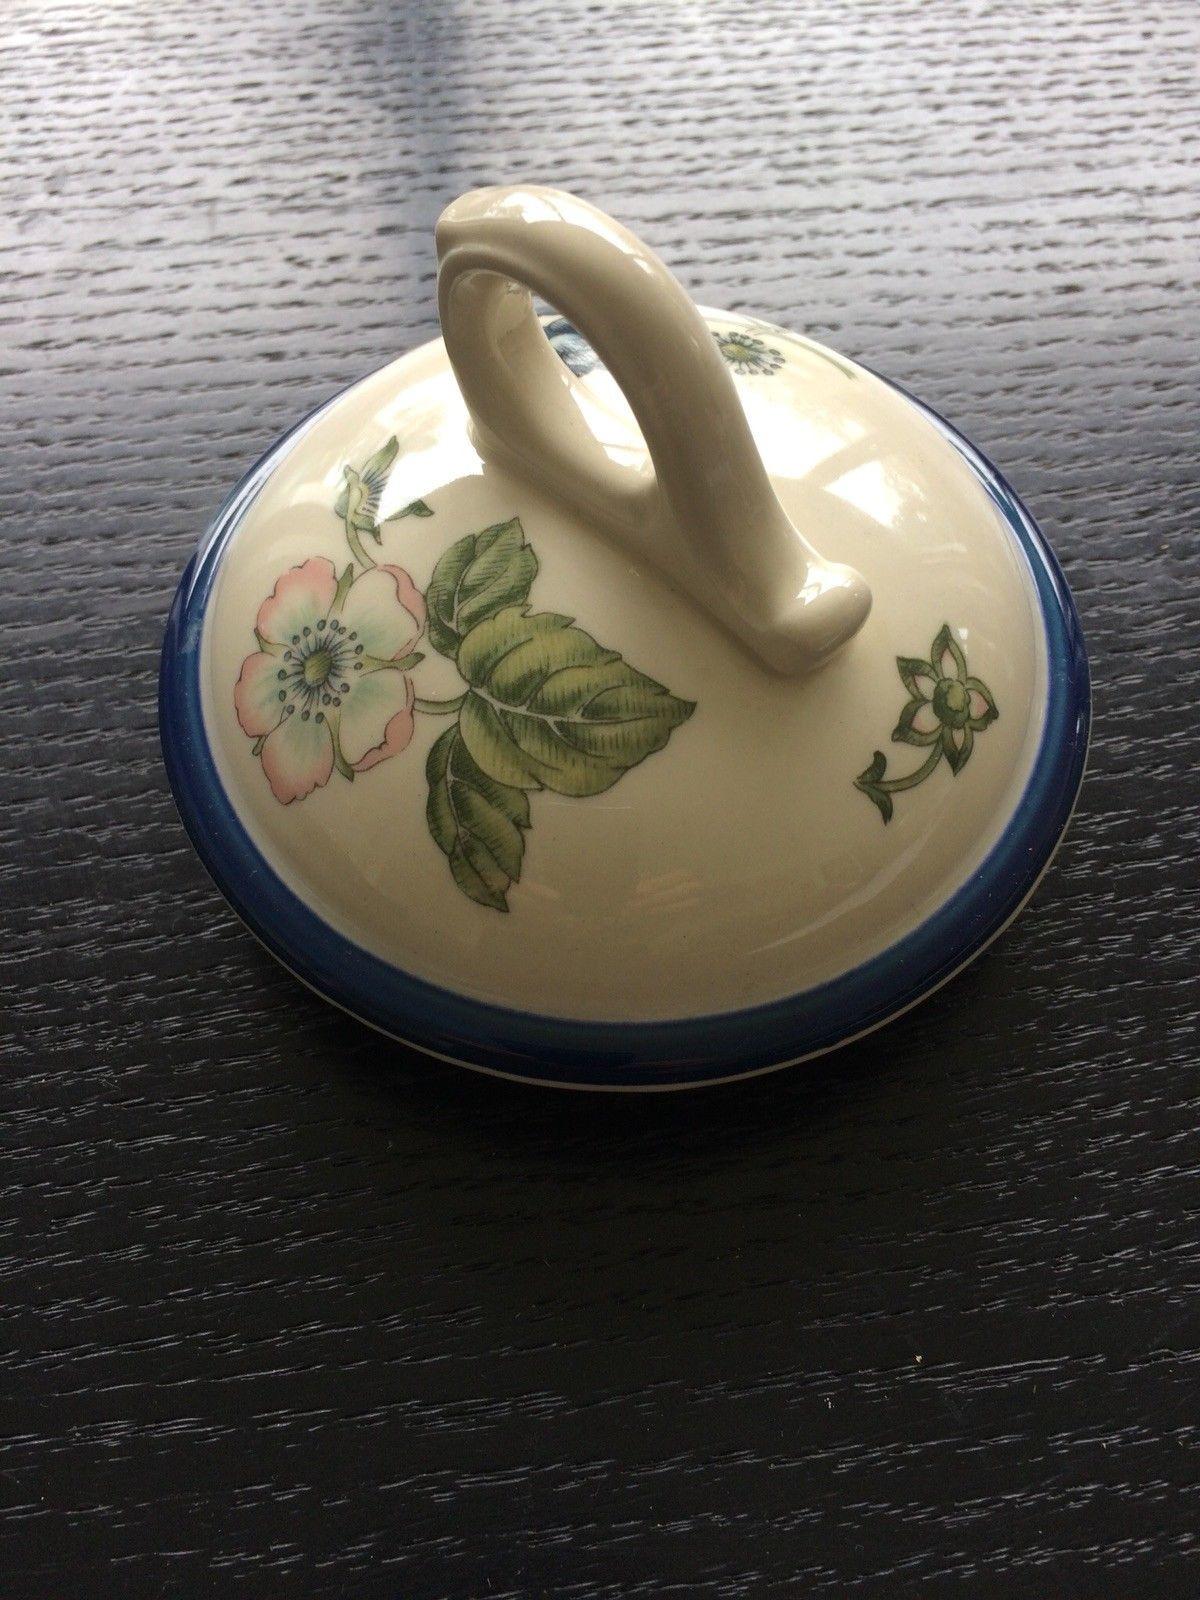 wedgwood kutani crane bud vase of wedgwood bramble coffee pot lid a3 50 picclick uk throughout 1 of 3 see more